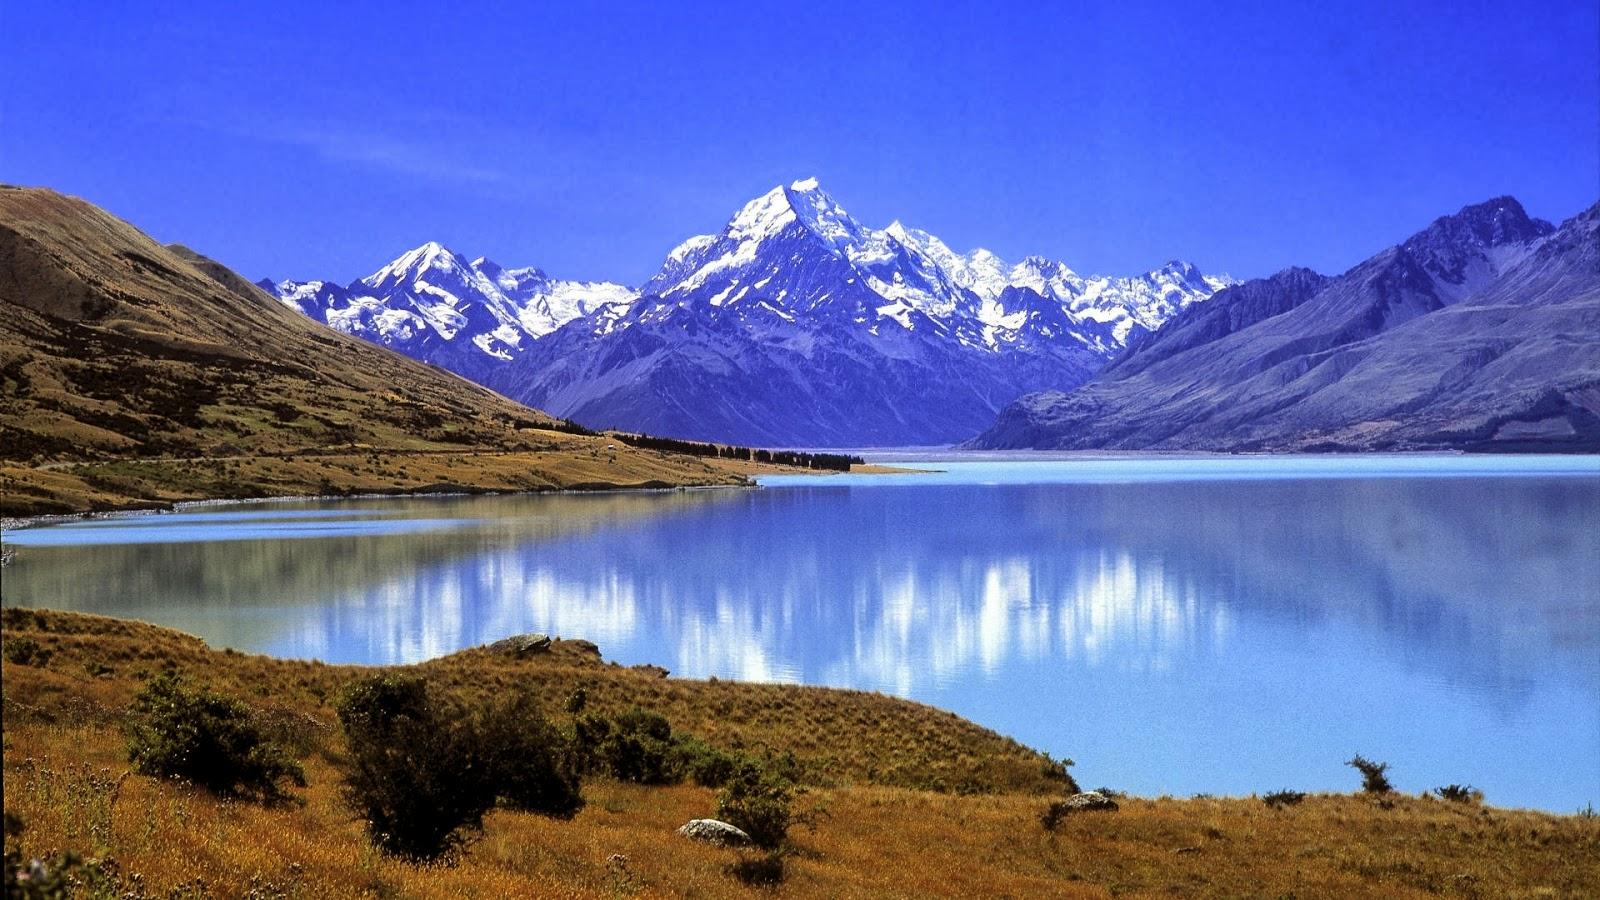 Hd wallpaper download nature - Full Hd Size Nature Wallpapers Free Downloads Full Hd High Res Nature